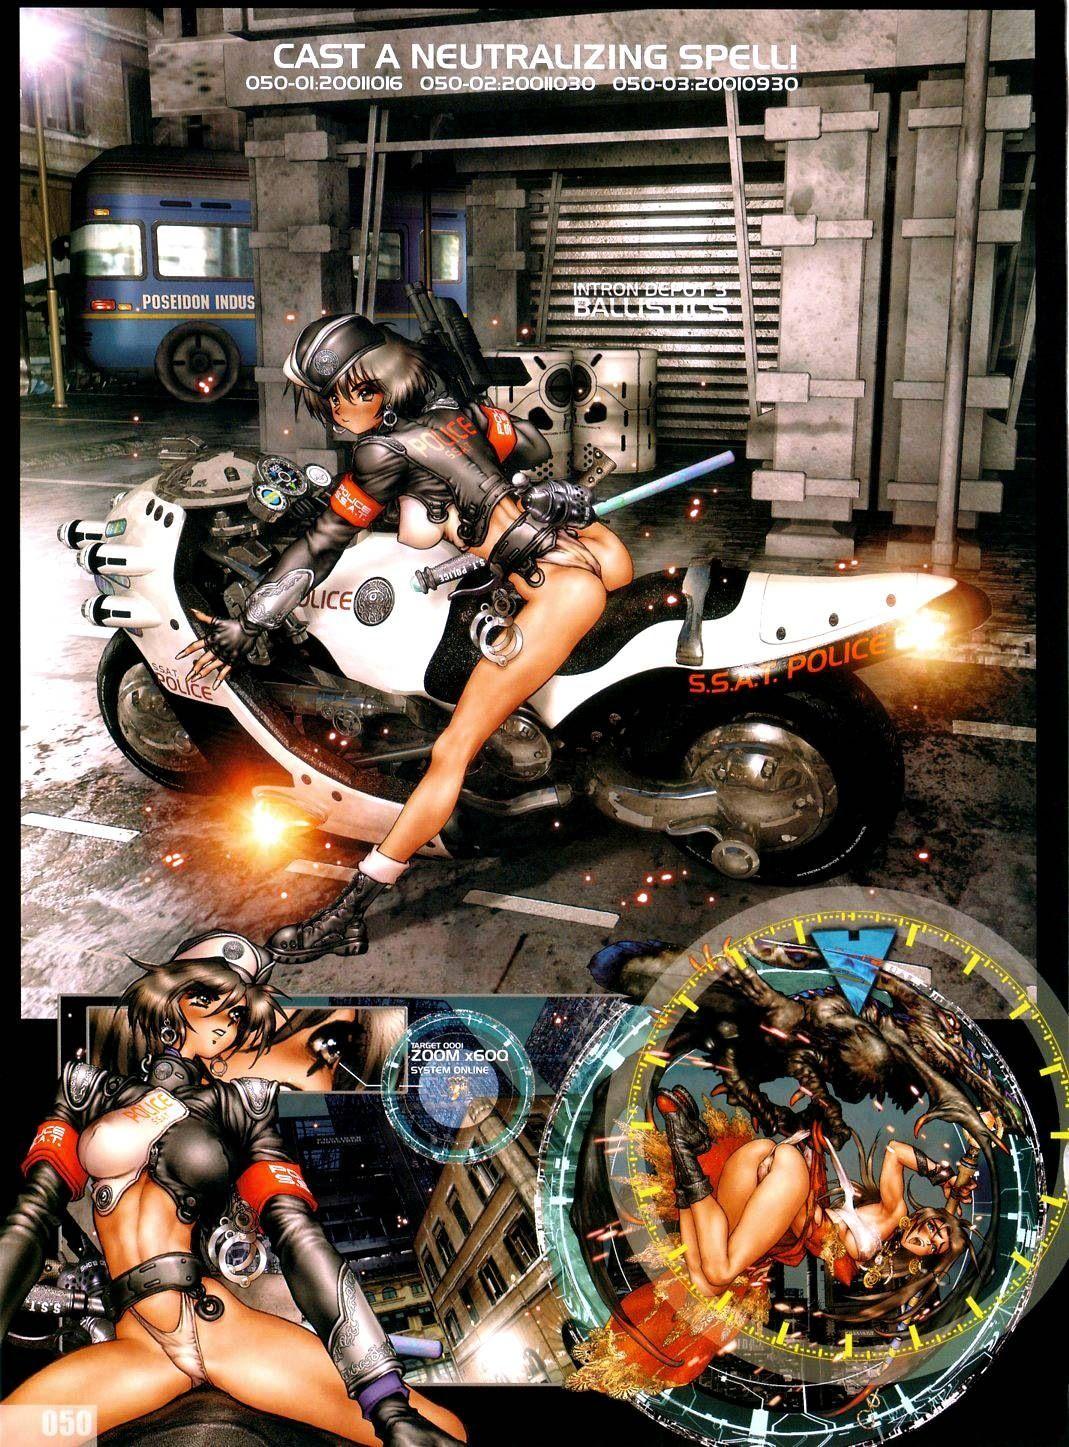 Intron Depot 3 Starship Police Masamune shirow, Manga